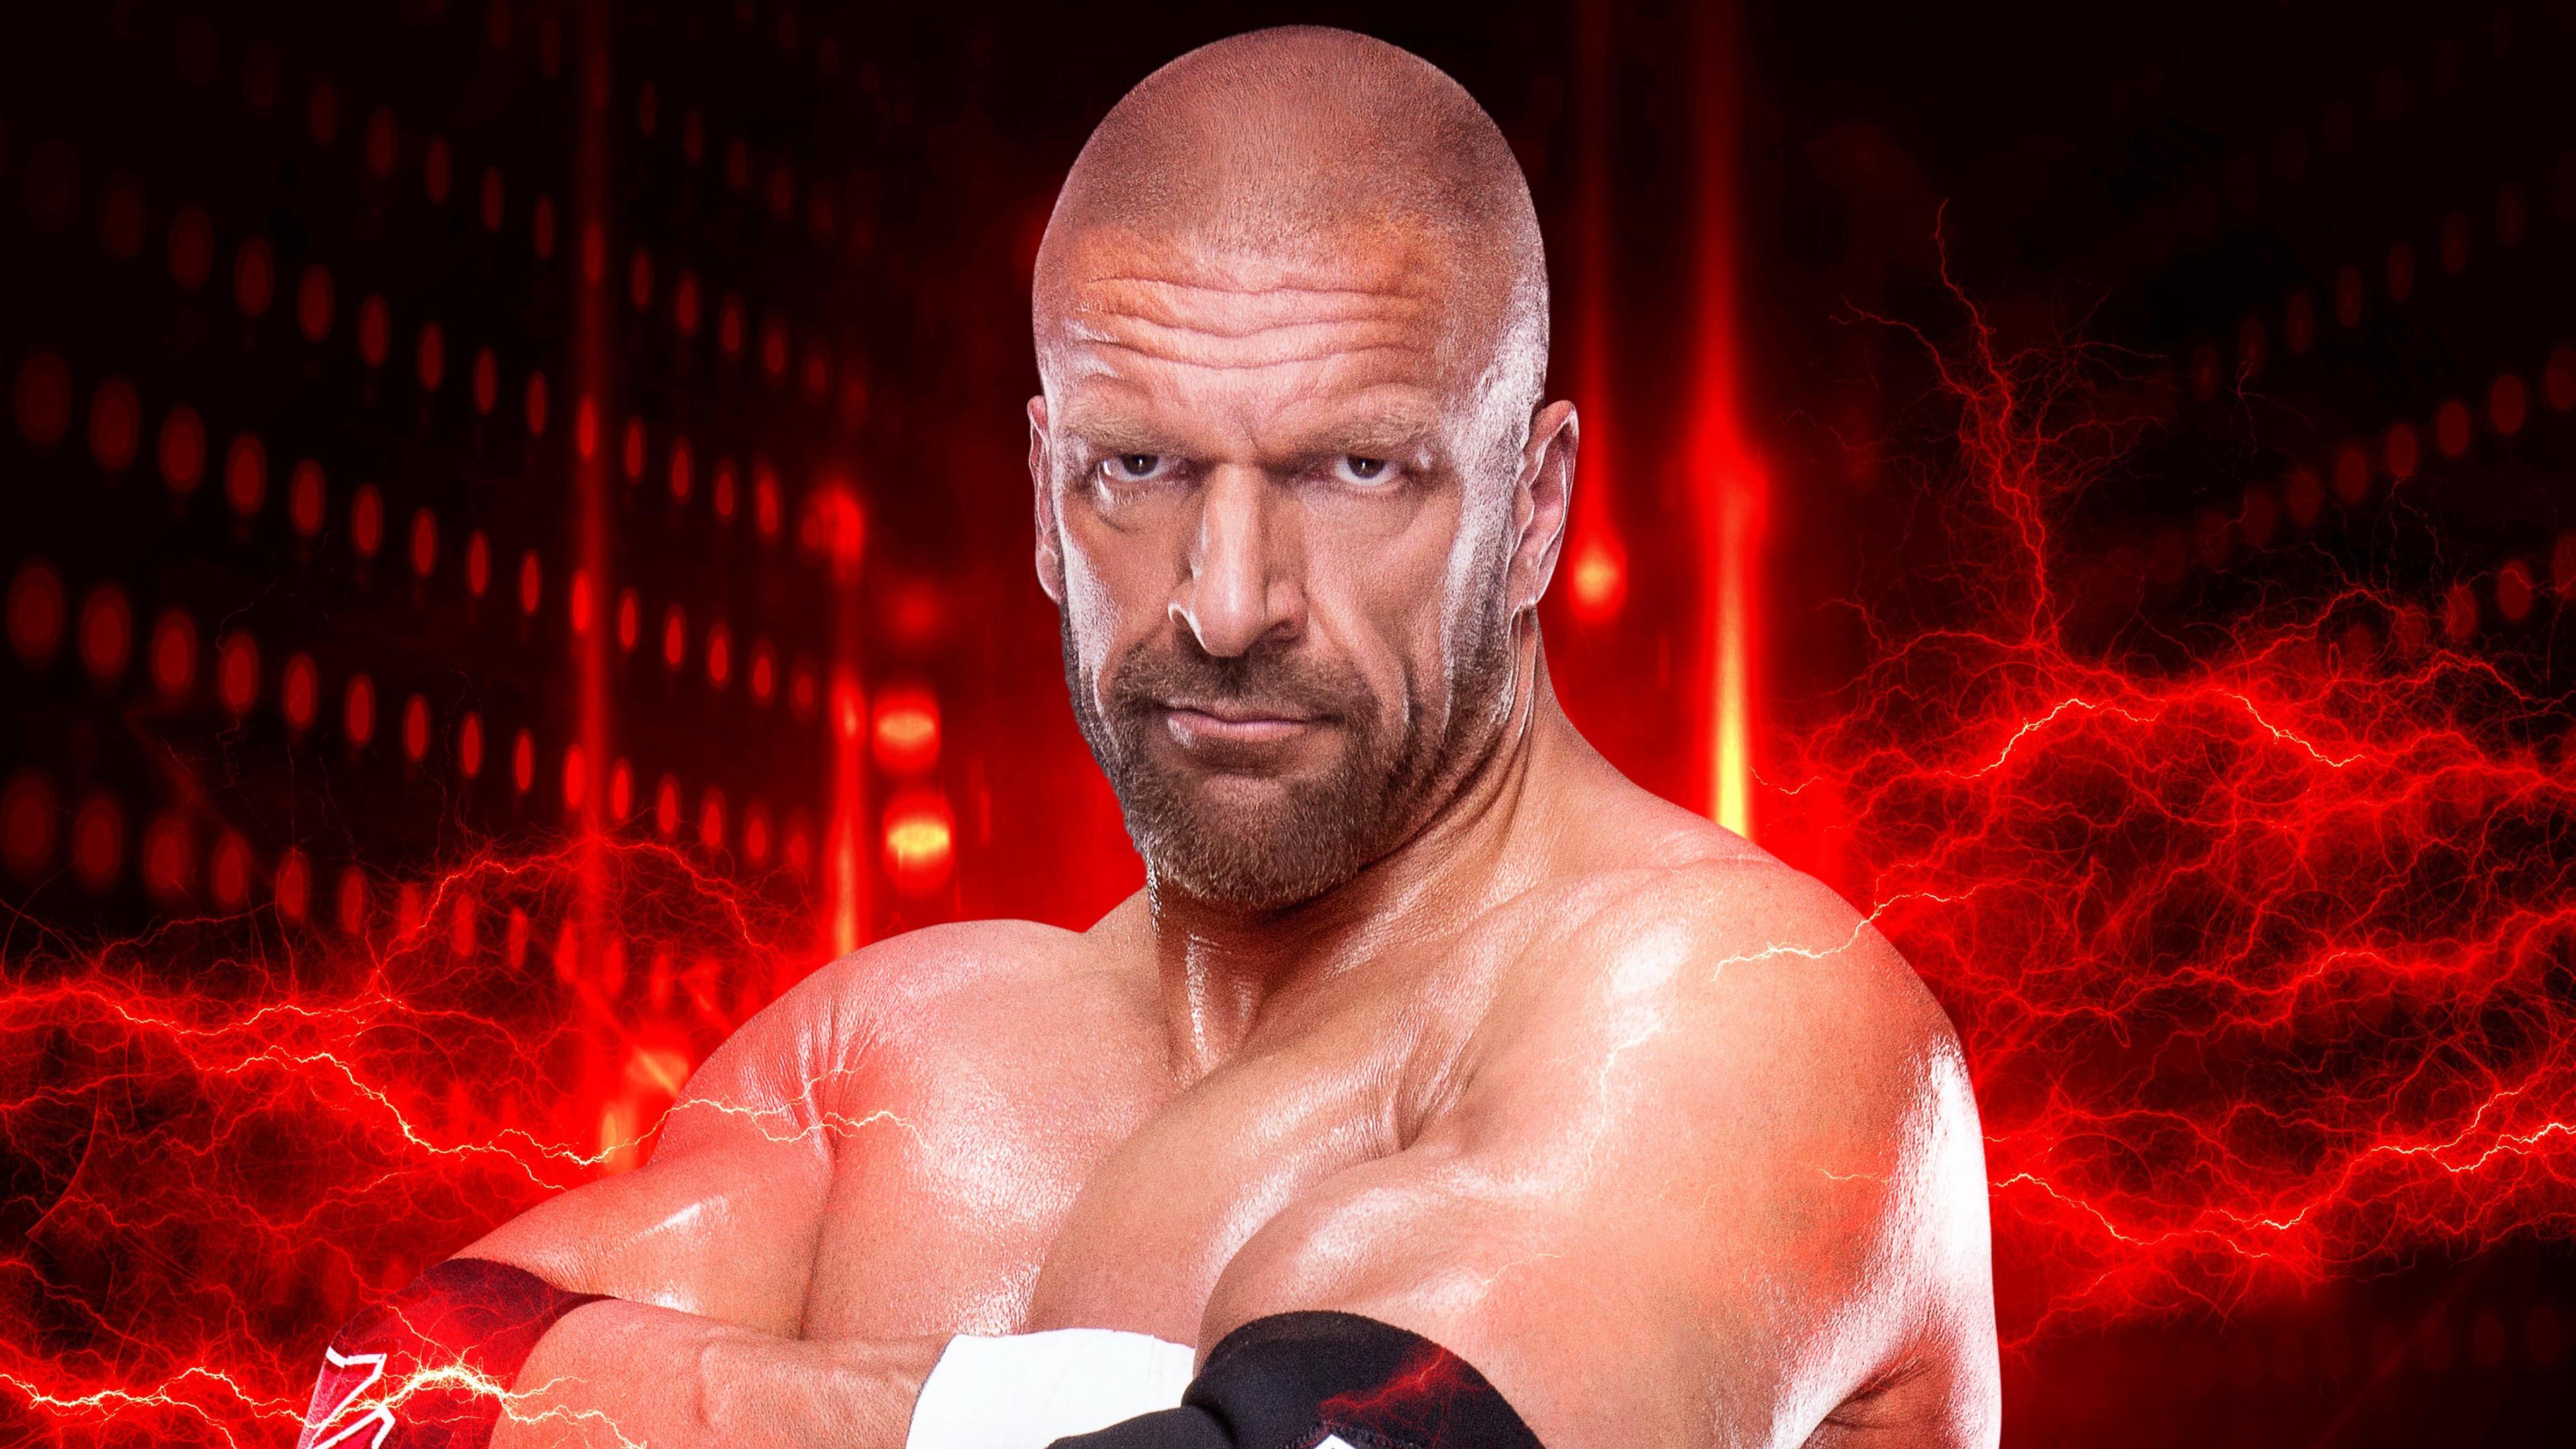 Triple H WWE 2K19, HD Games, 4k Wallpapers, Images